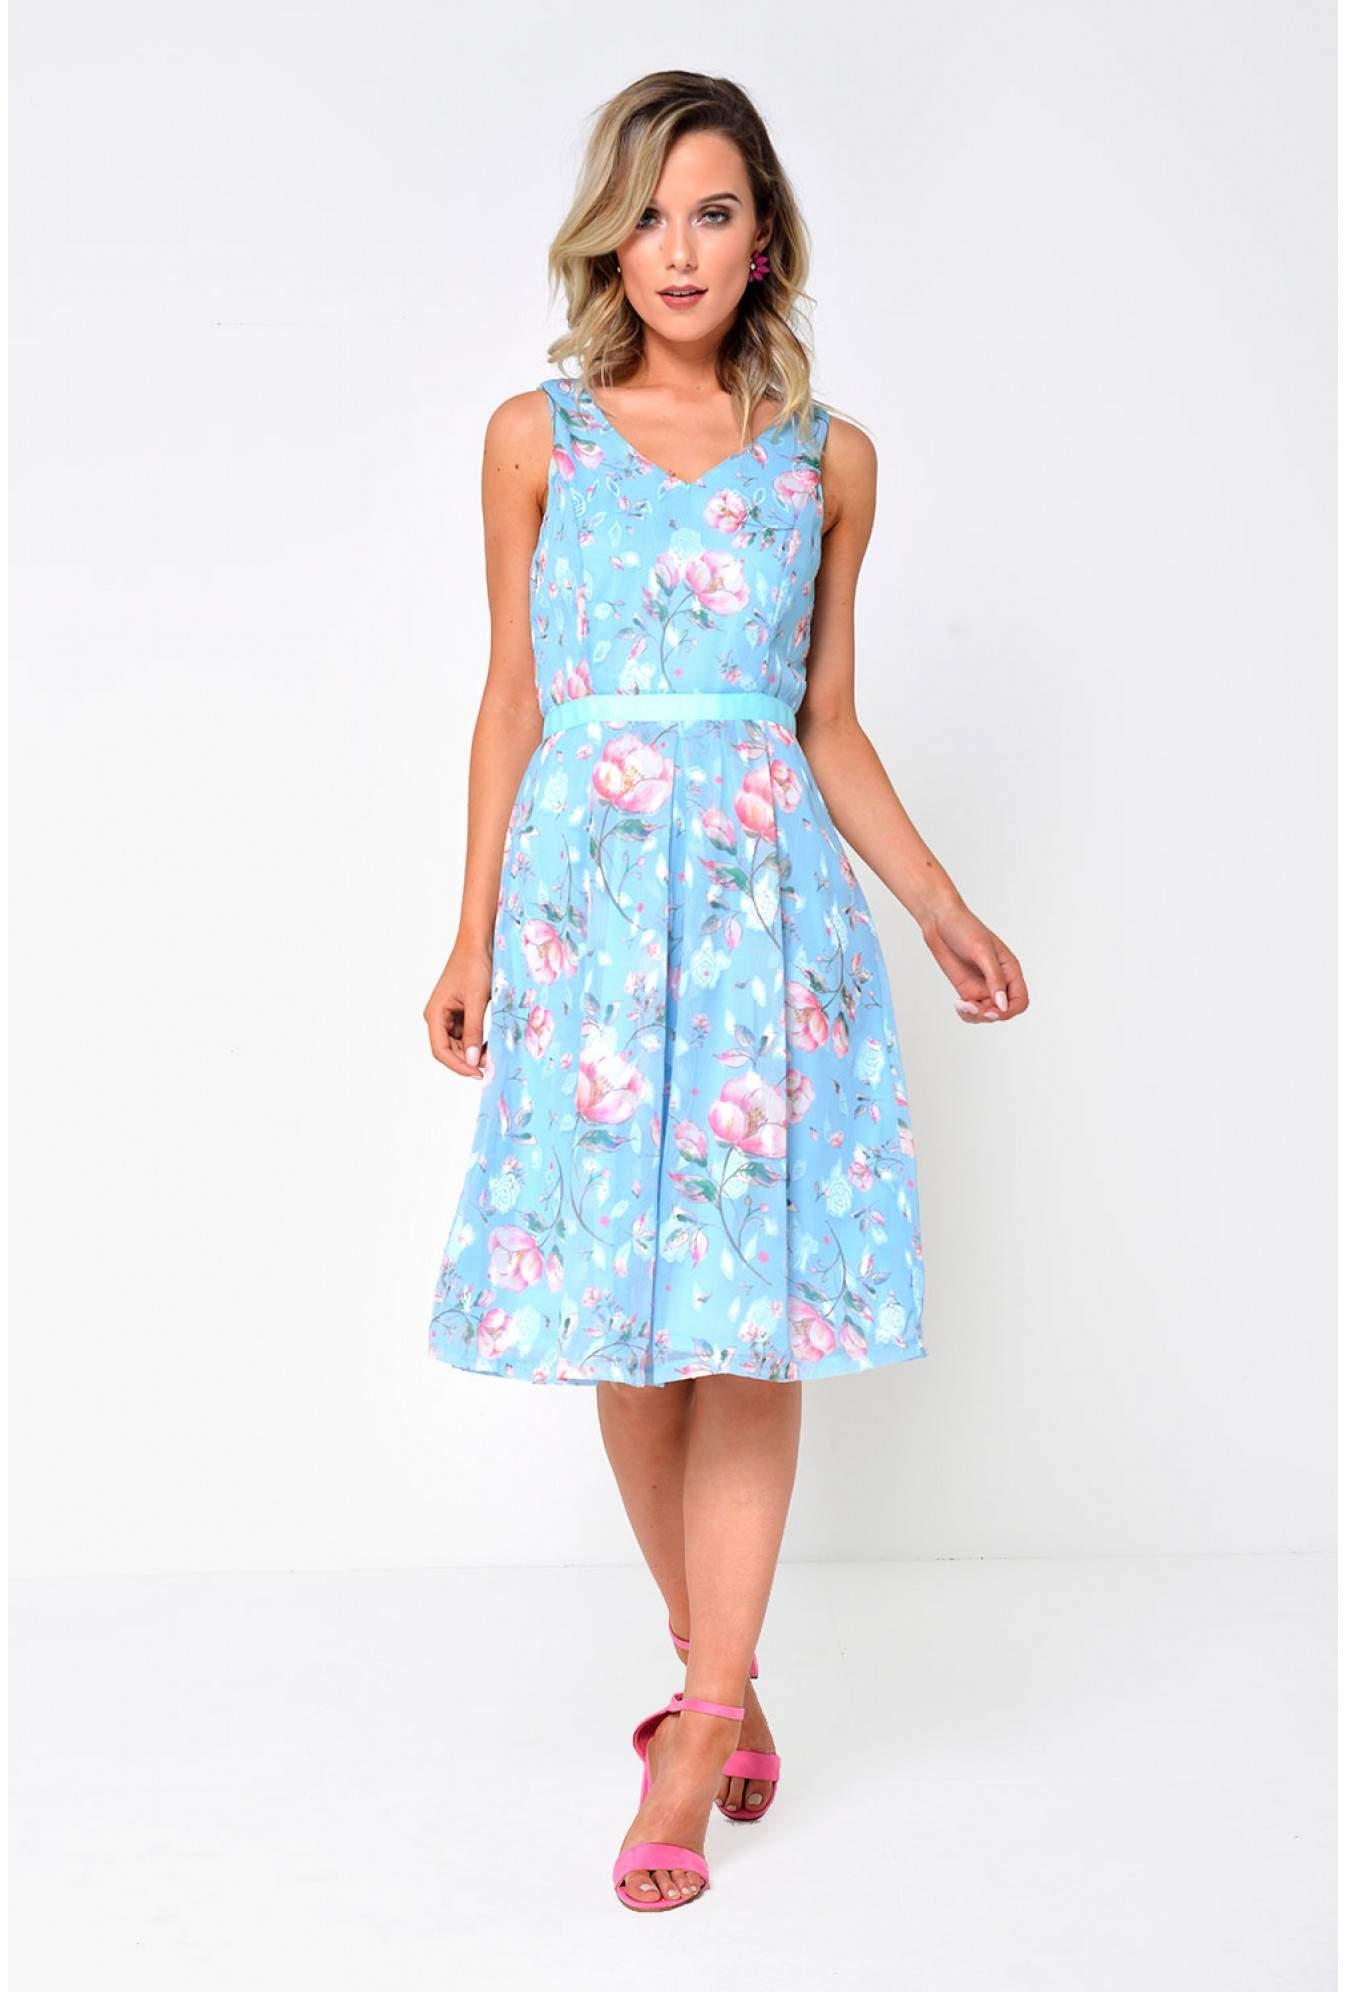 da48099138 Marc Angelo Jade Floral Dress in Light Blue | iCLOTHING